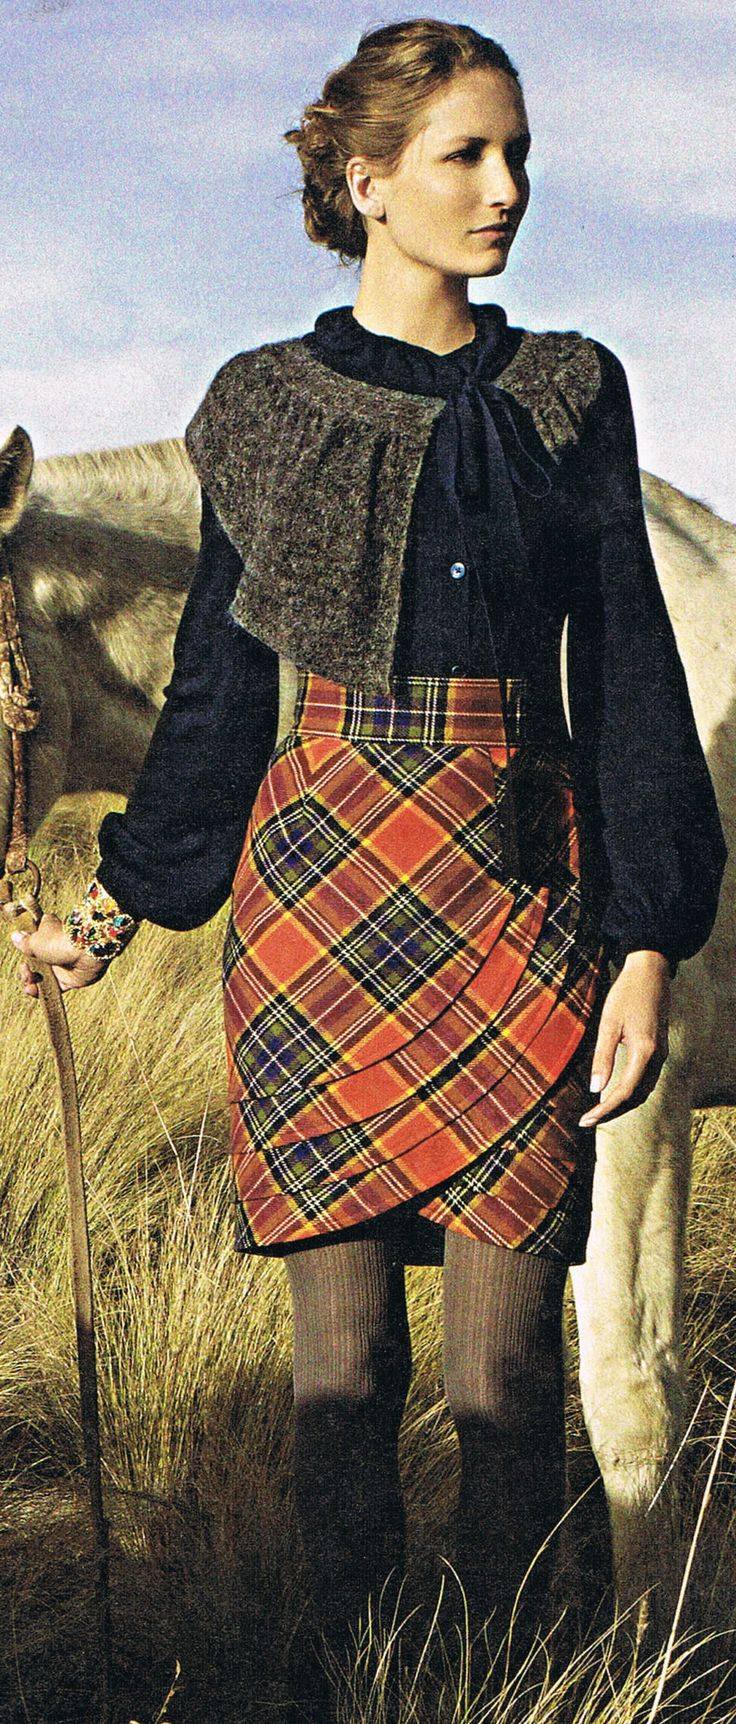 love this draped plaid skirt - gonna make one!  http://media-cache-ec0.pinimg.com/originals/3d/ce/75/3dce757e0a35b52d95c9d64f4cd479b7.jpg